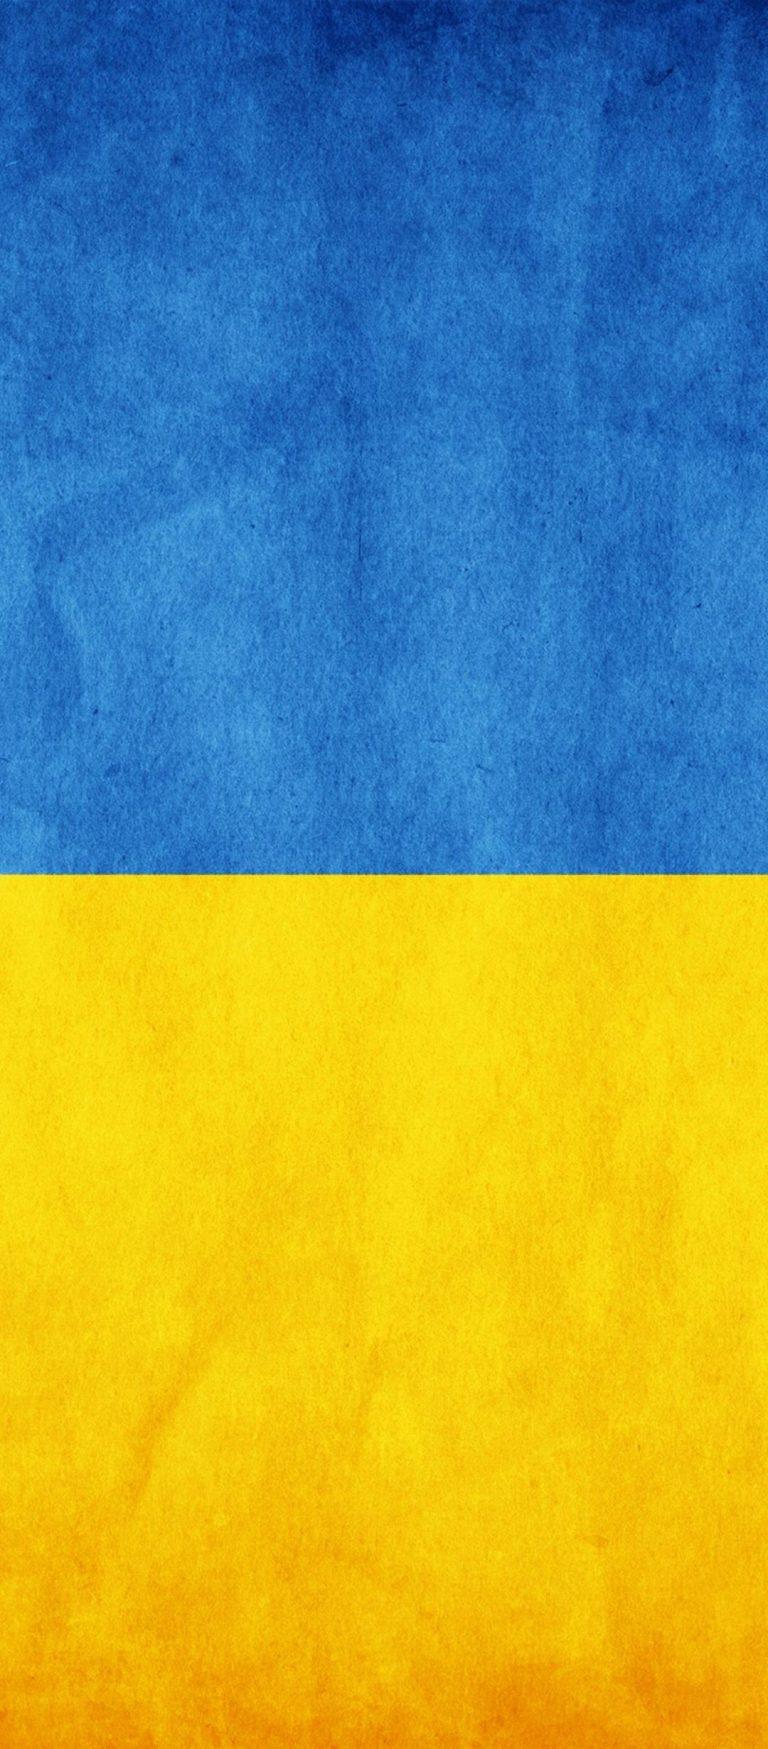 Ukraine Flag Texture 1080x2460 768x1749